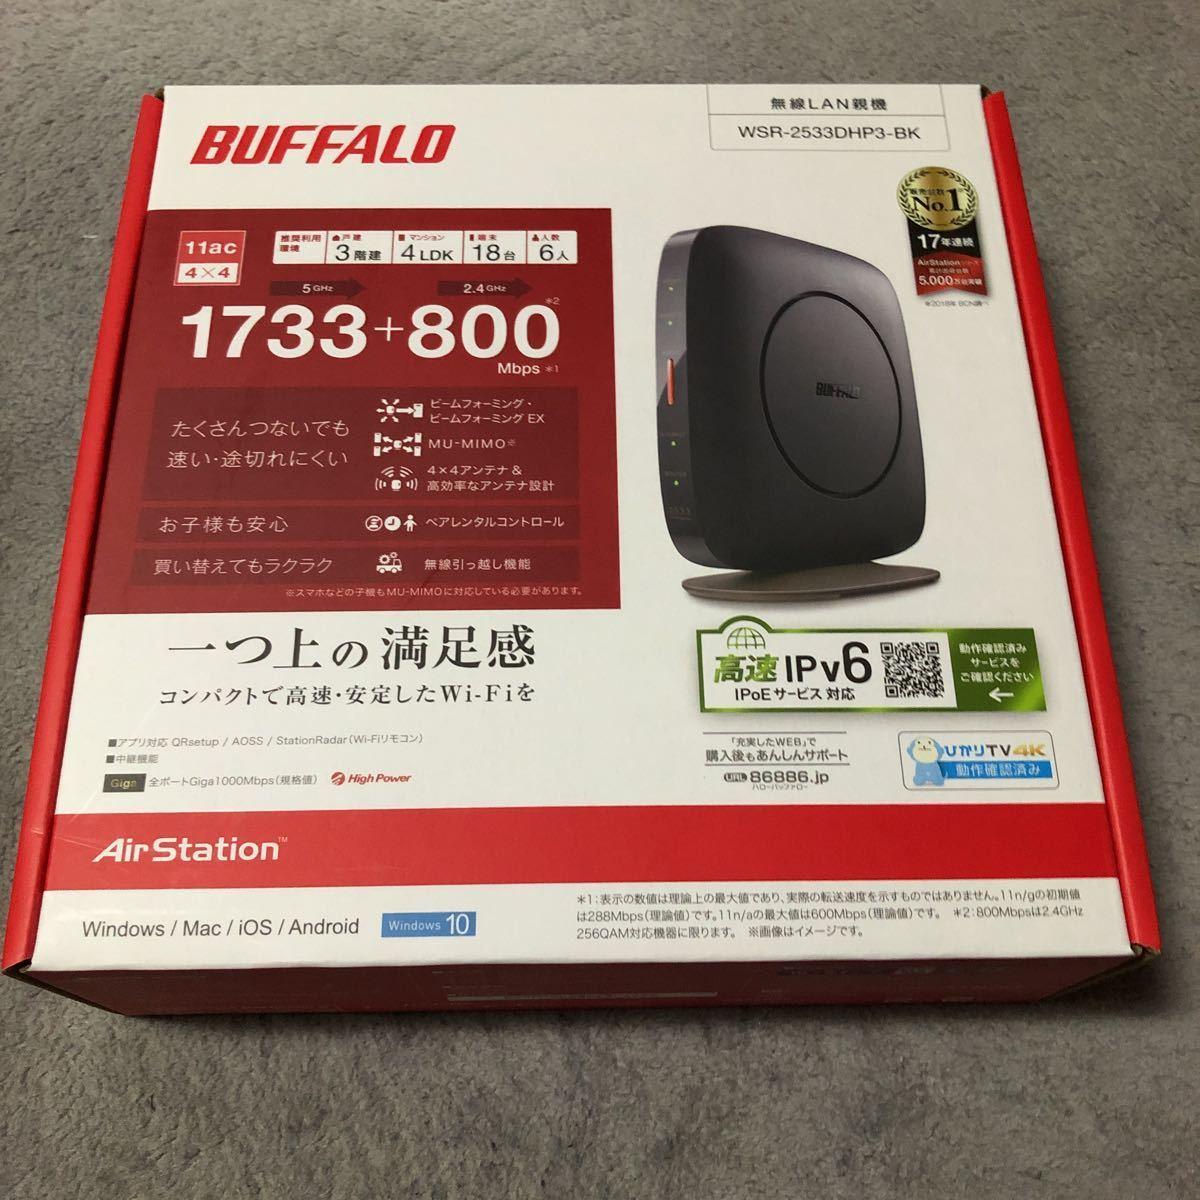 送料無料 新品未開封正規品 バッファロー BUFFALO 11ac/n/a/g/b IPv6対応 1733+800Mbps 無線LAN親機 中継機能 ブラック WSR-2533DHP3-BK